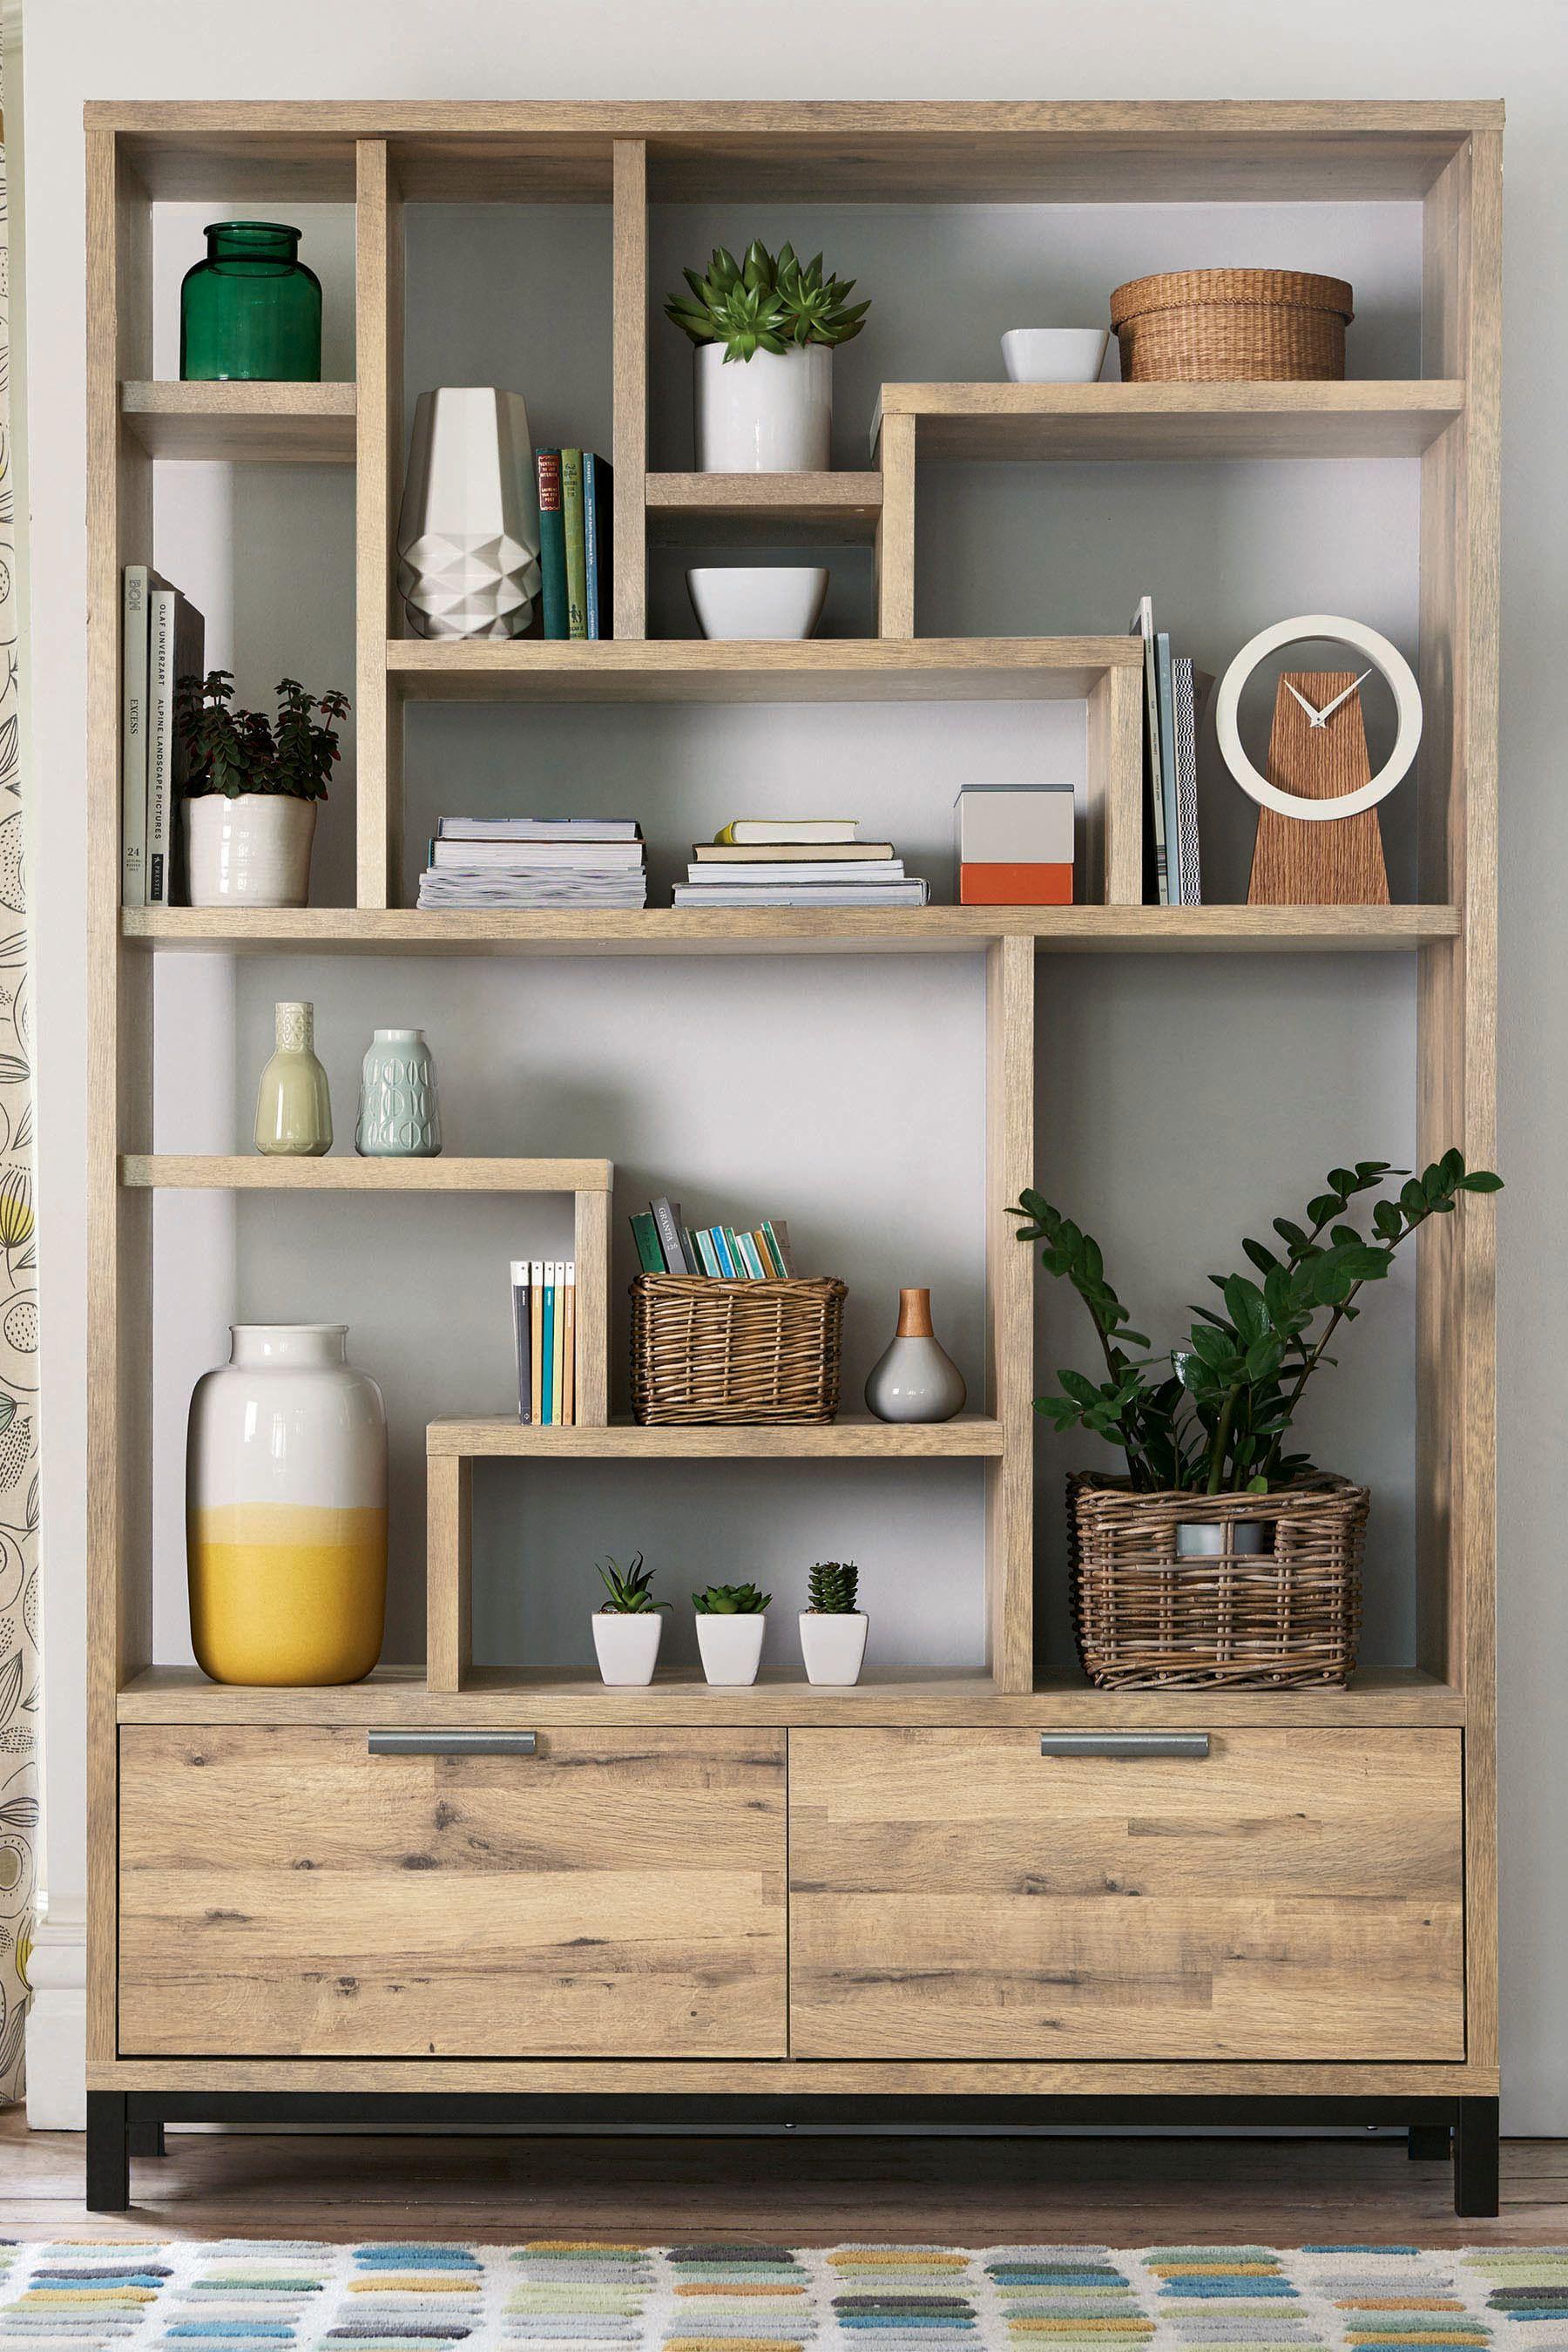 Buy Bronx Display Shelf from the Next UK online sh